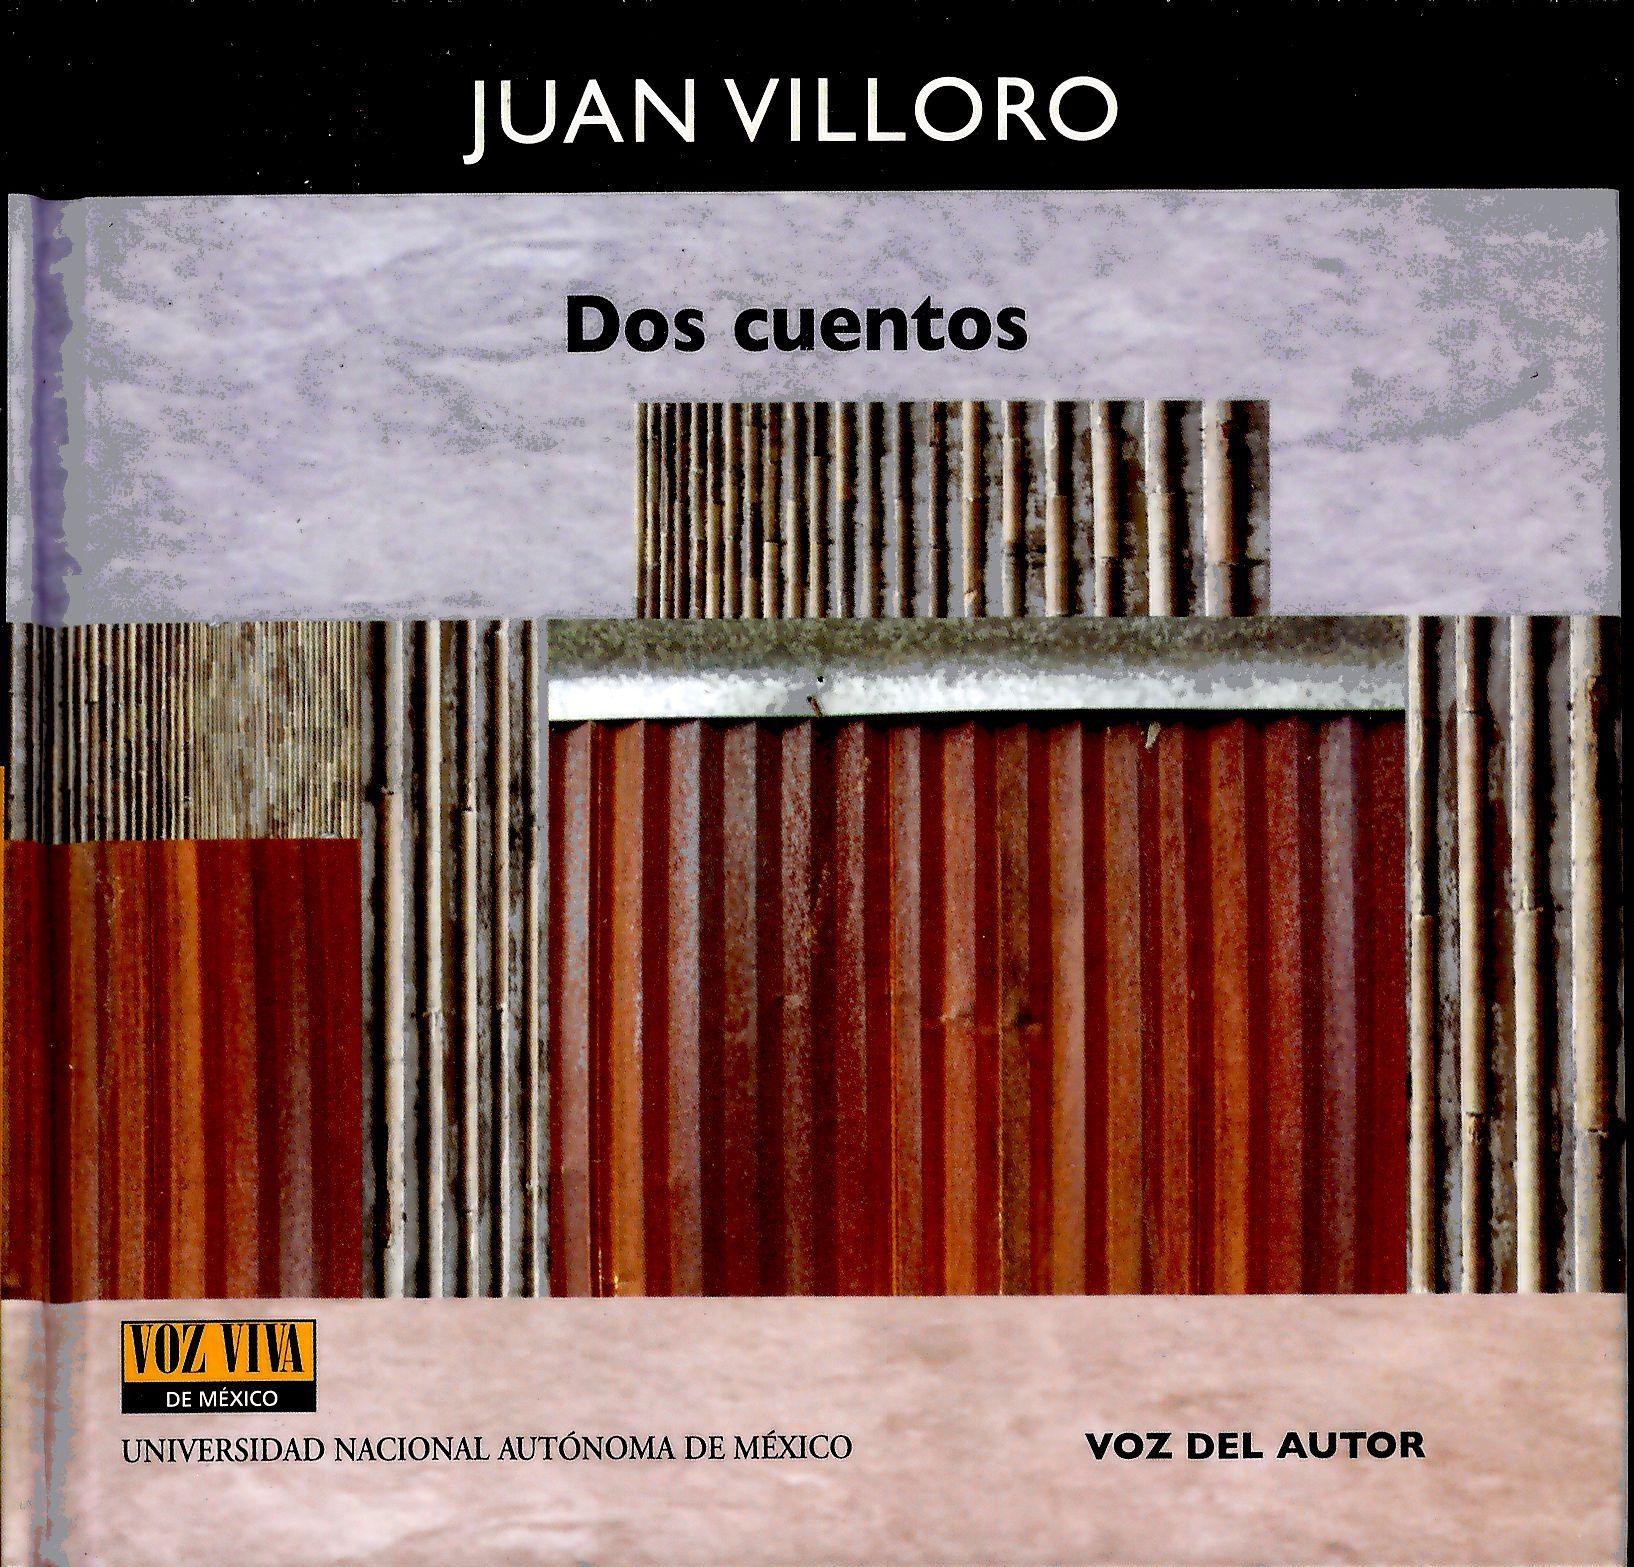 Juan Villoro, Dos cuentos